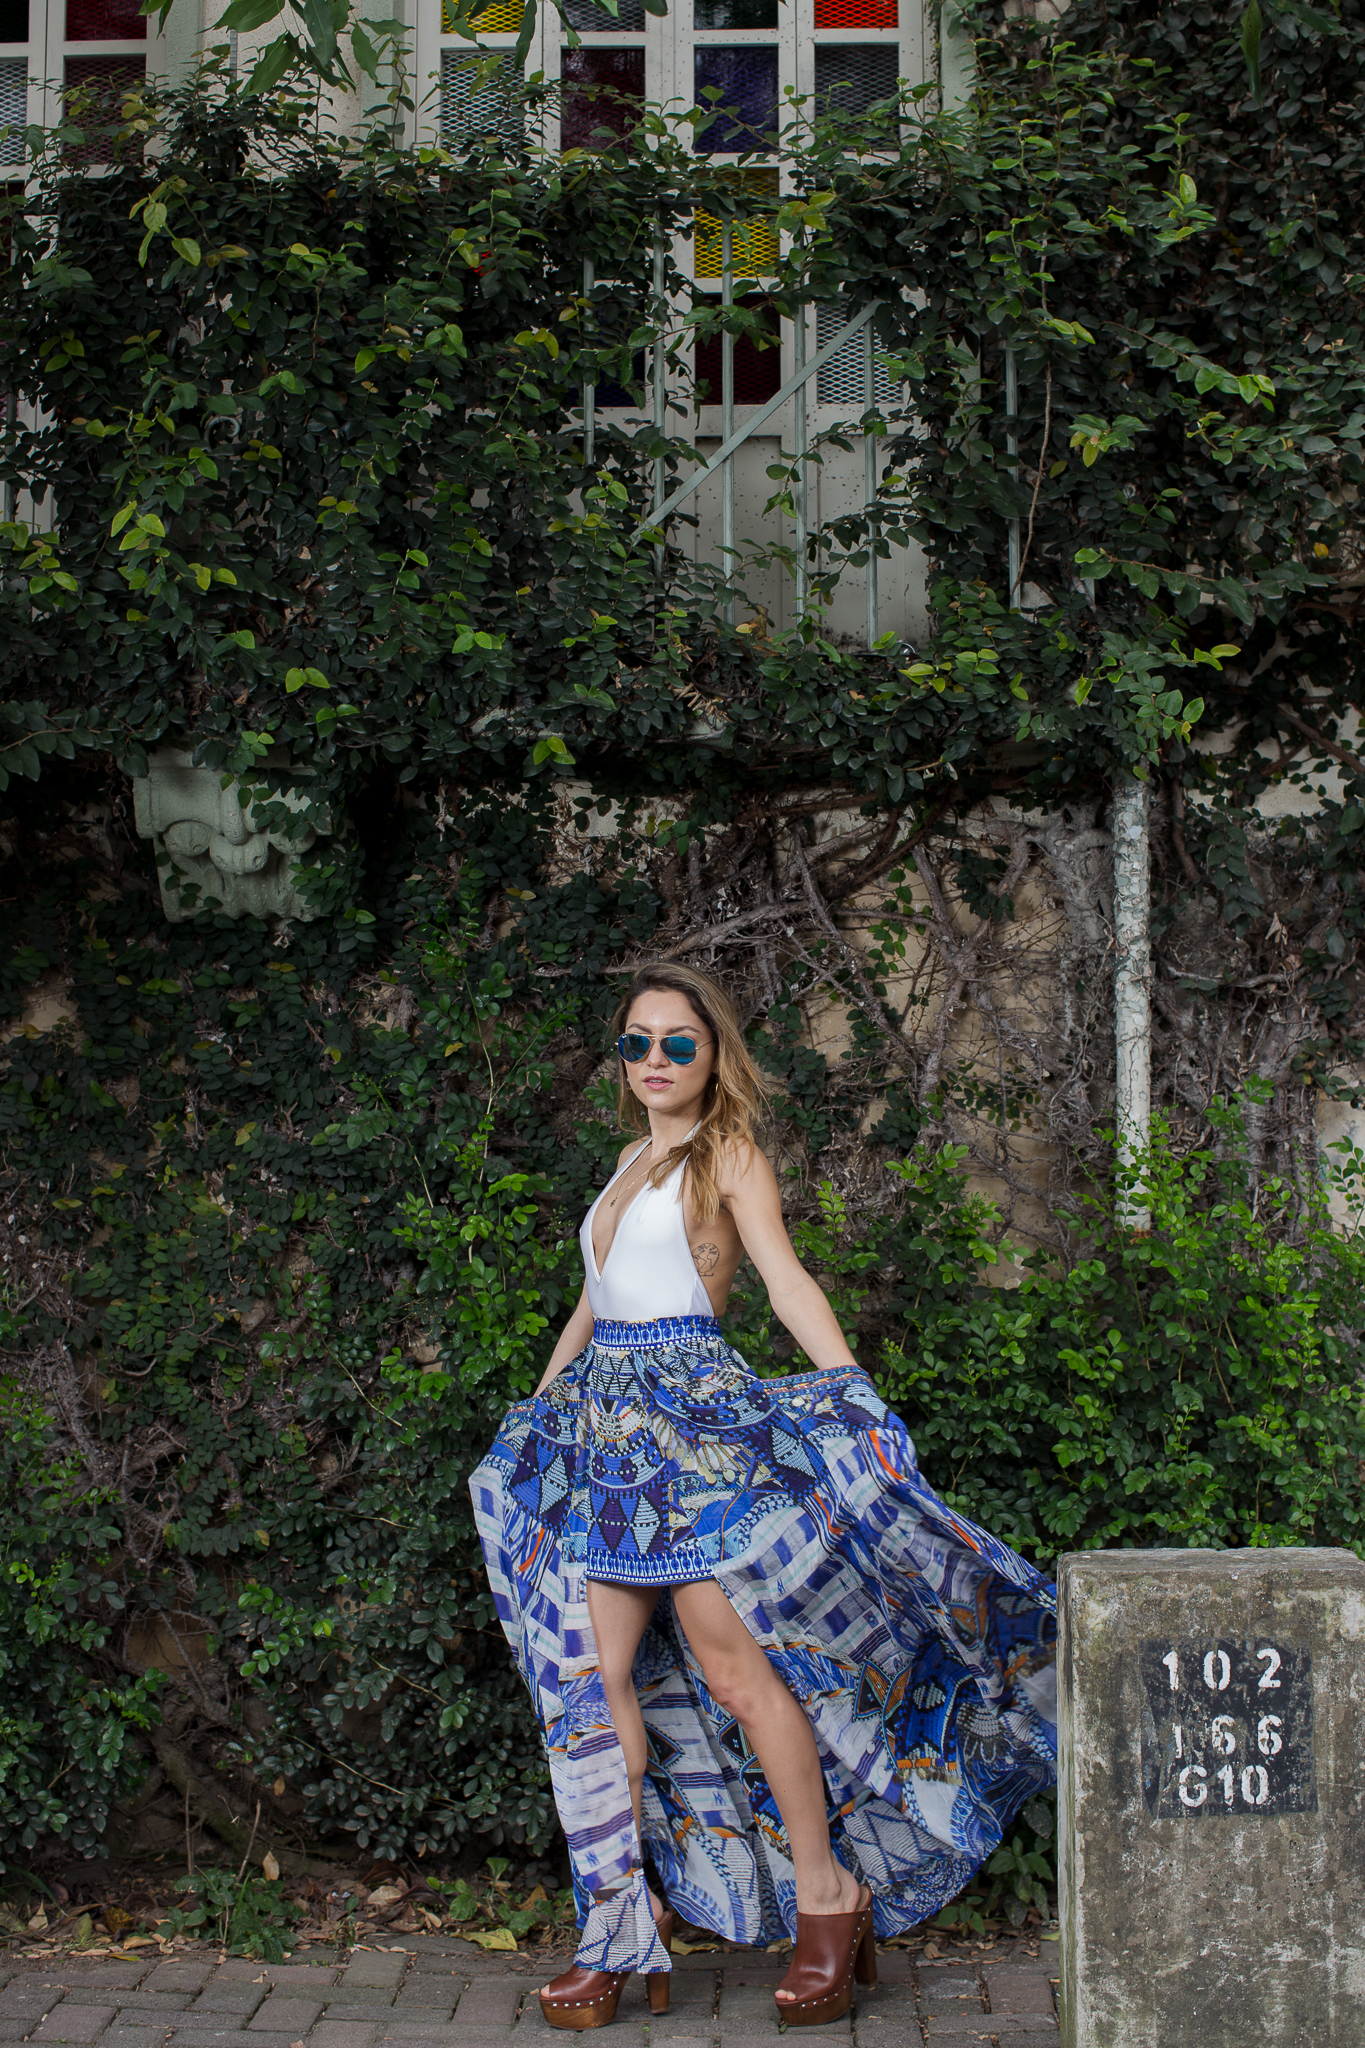 Whitney's Wonderland NYC Top Fashion Blogger wears Camilla silk digital printed skirt, American Apparel white bodysuit and RayBan blue mirrored sunglasses in Barrio Amon